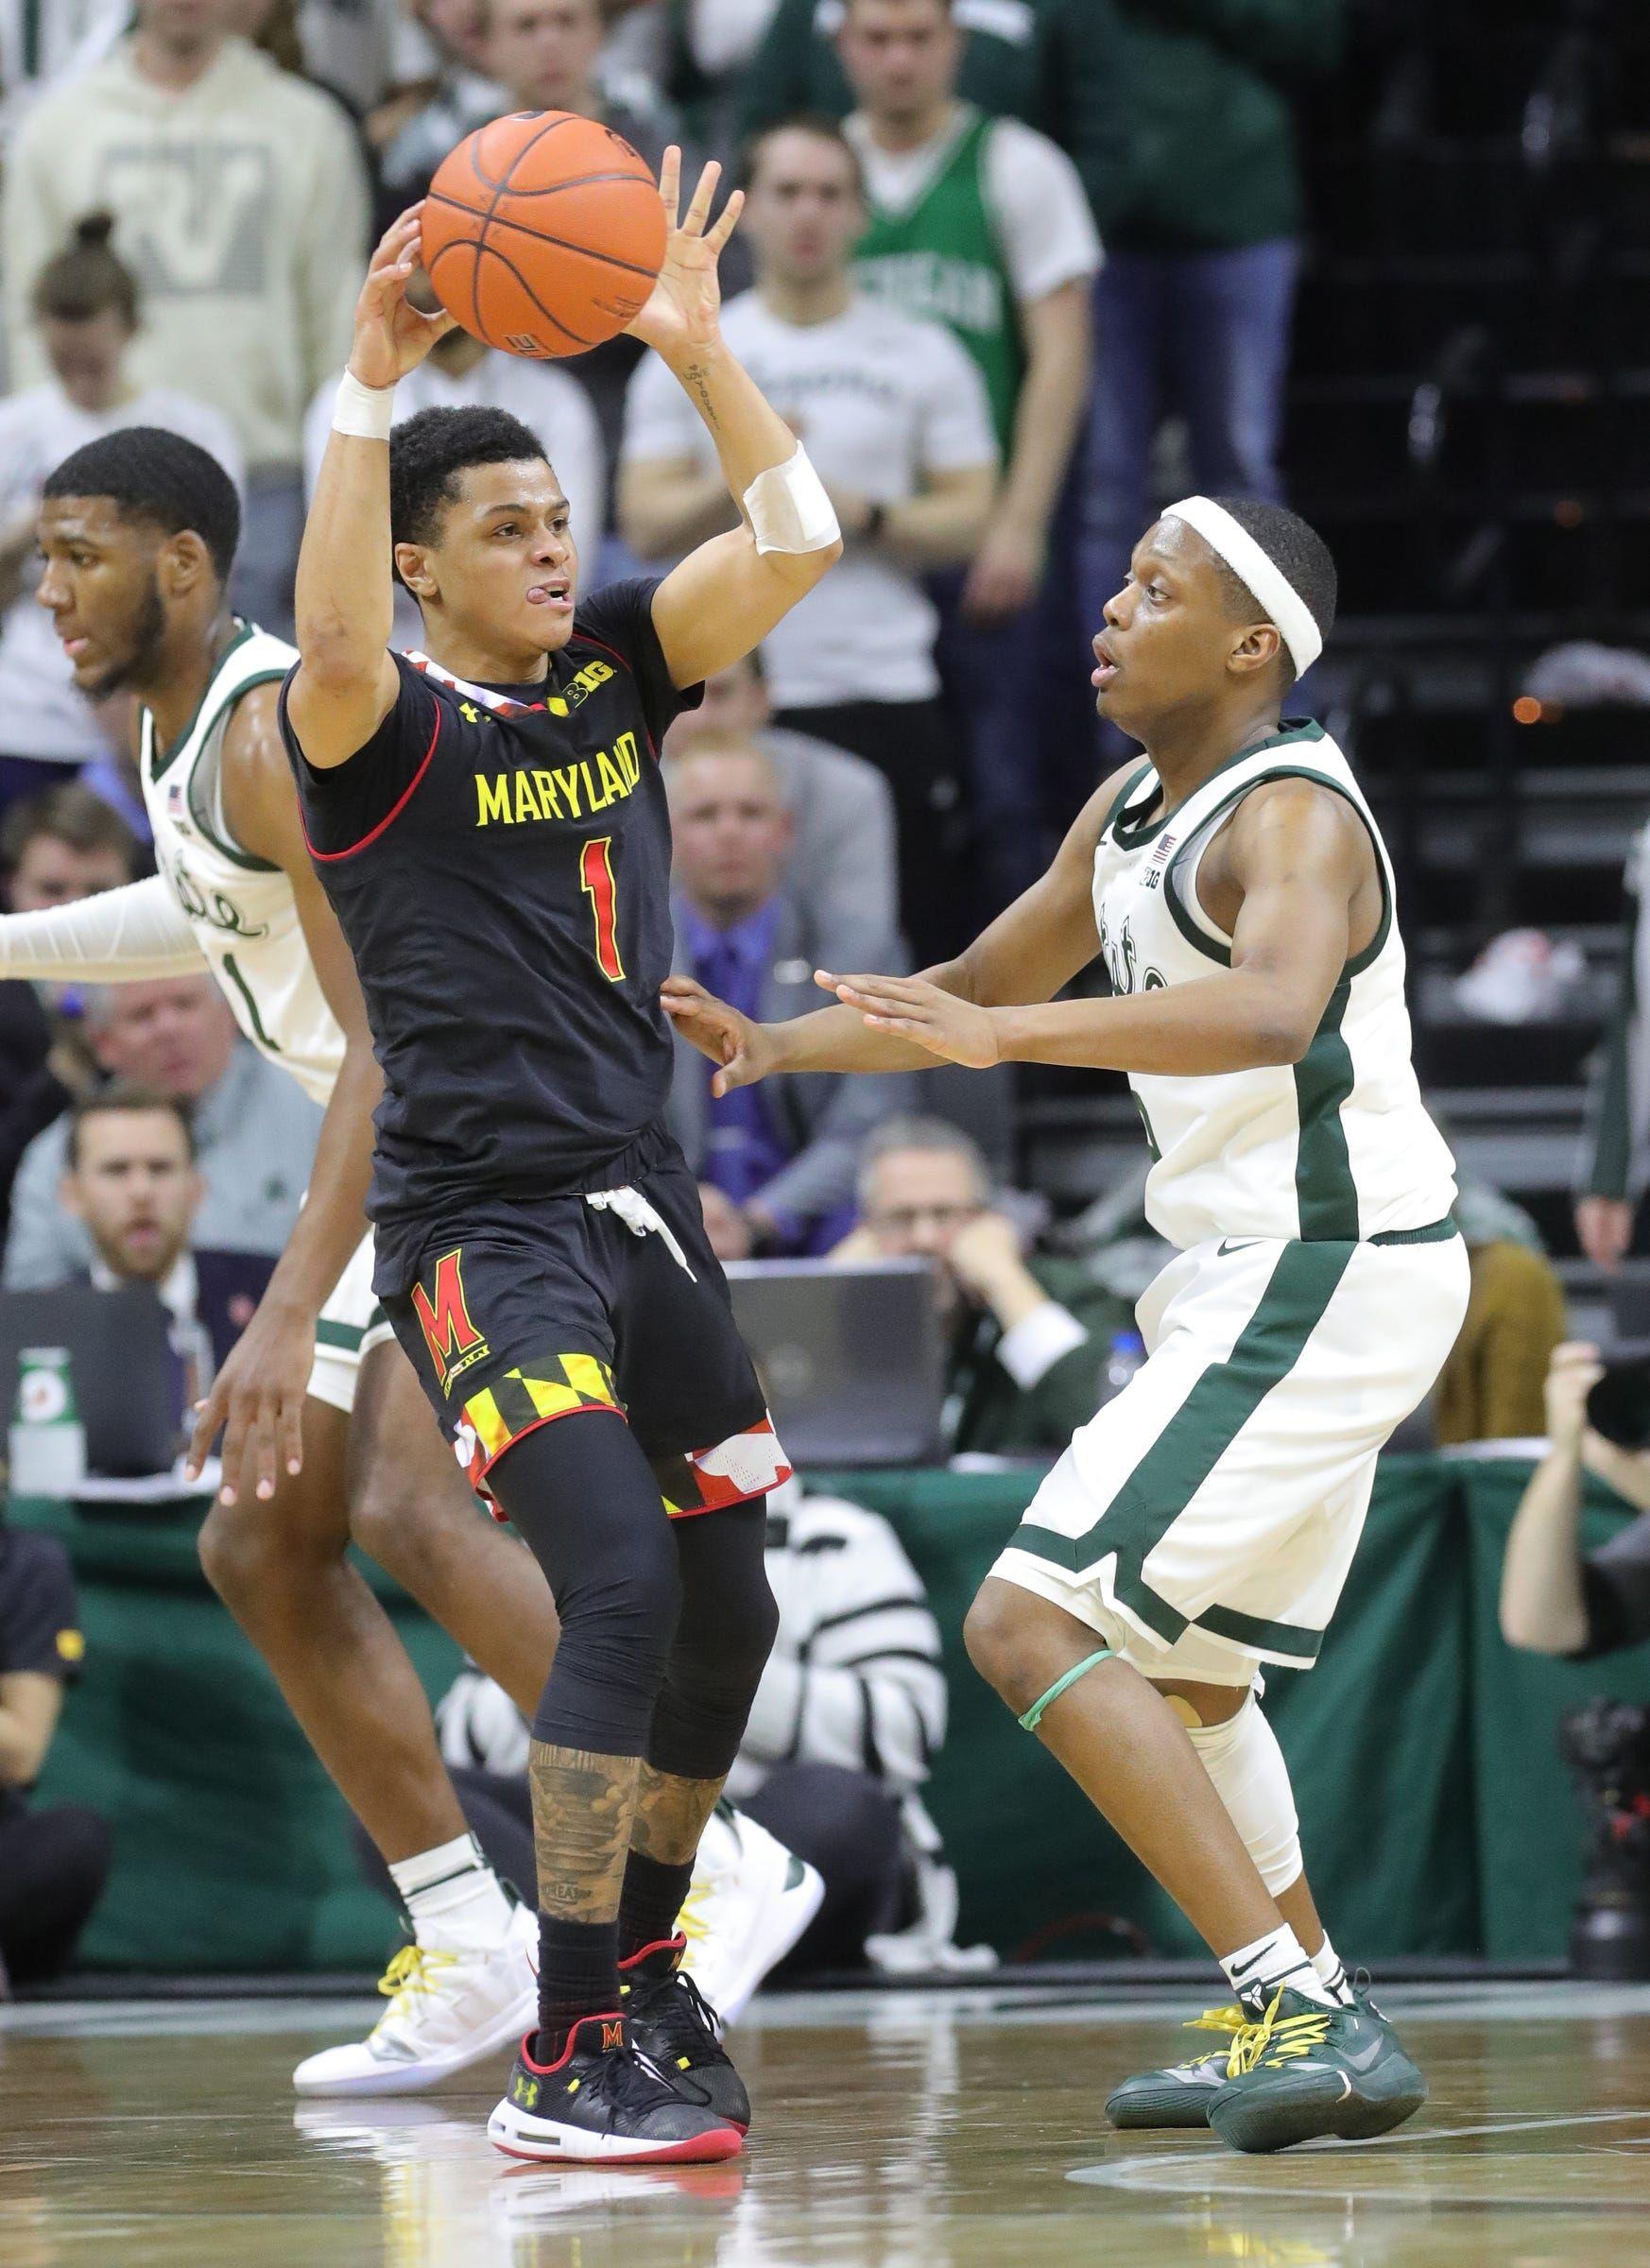 No. 25 Michigan State basketball vs. No. 9 Maryland